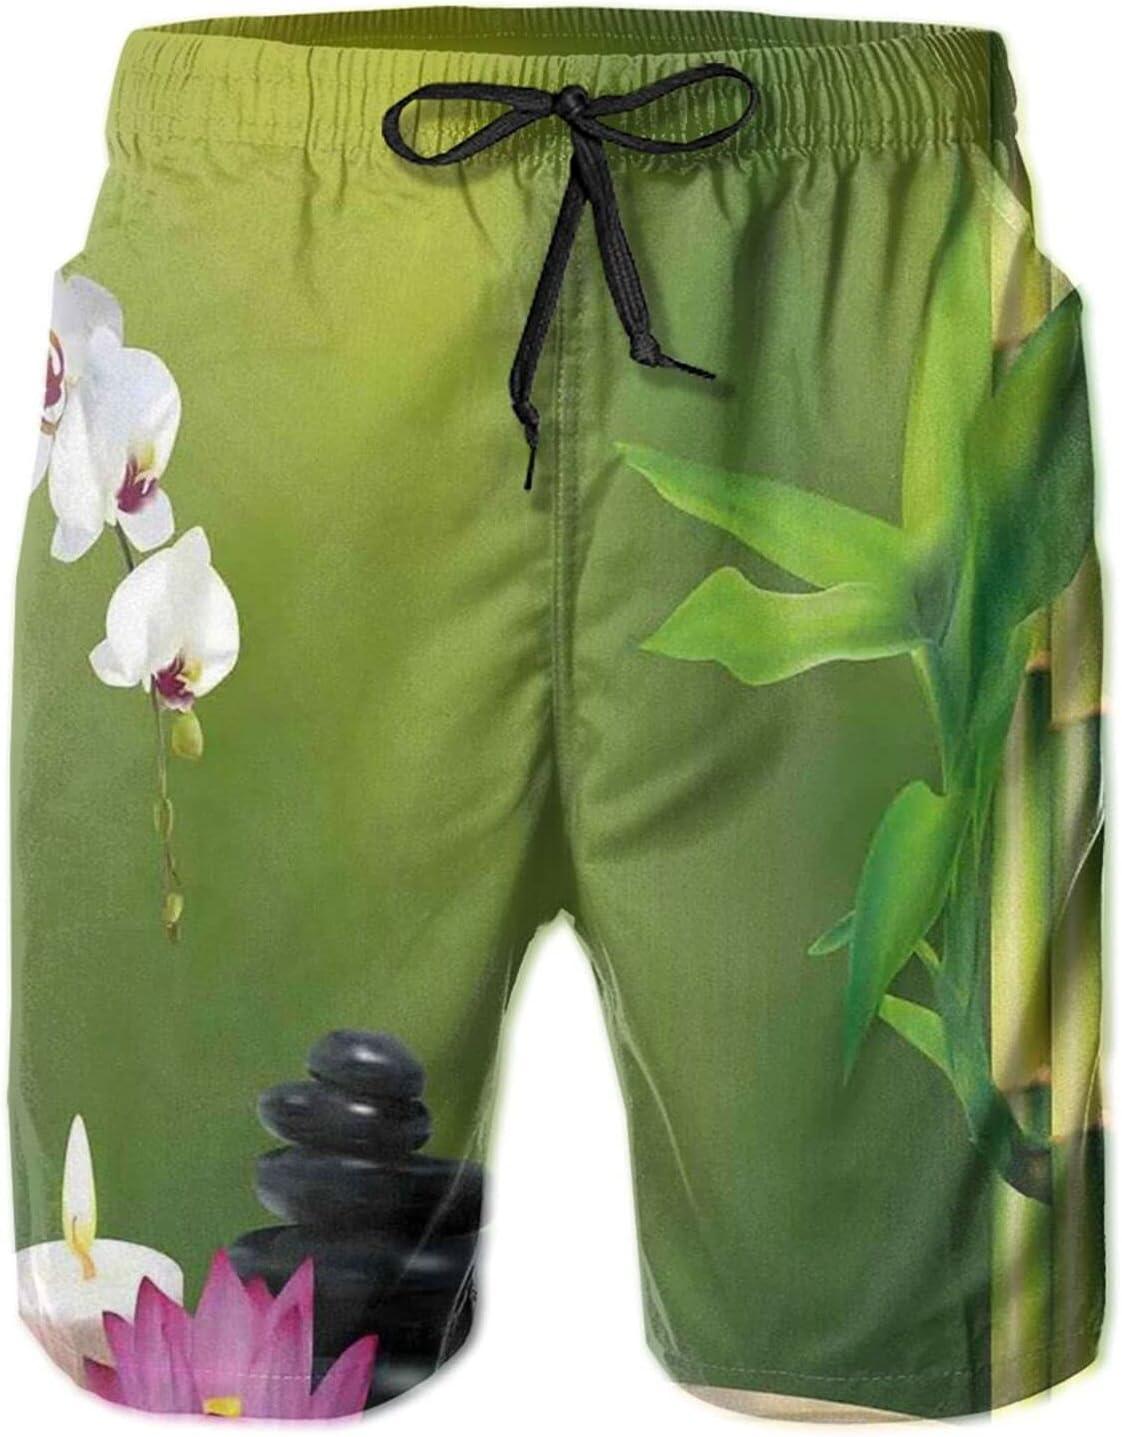 YAZXHJAZ Men's Board Shorts Spa Bamboo Flower Zen Stone Quick Dry Swimwear Beach Trunks